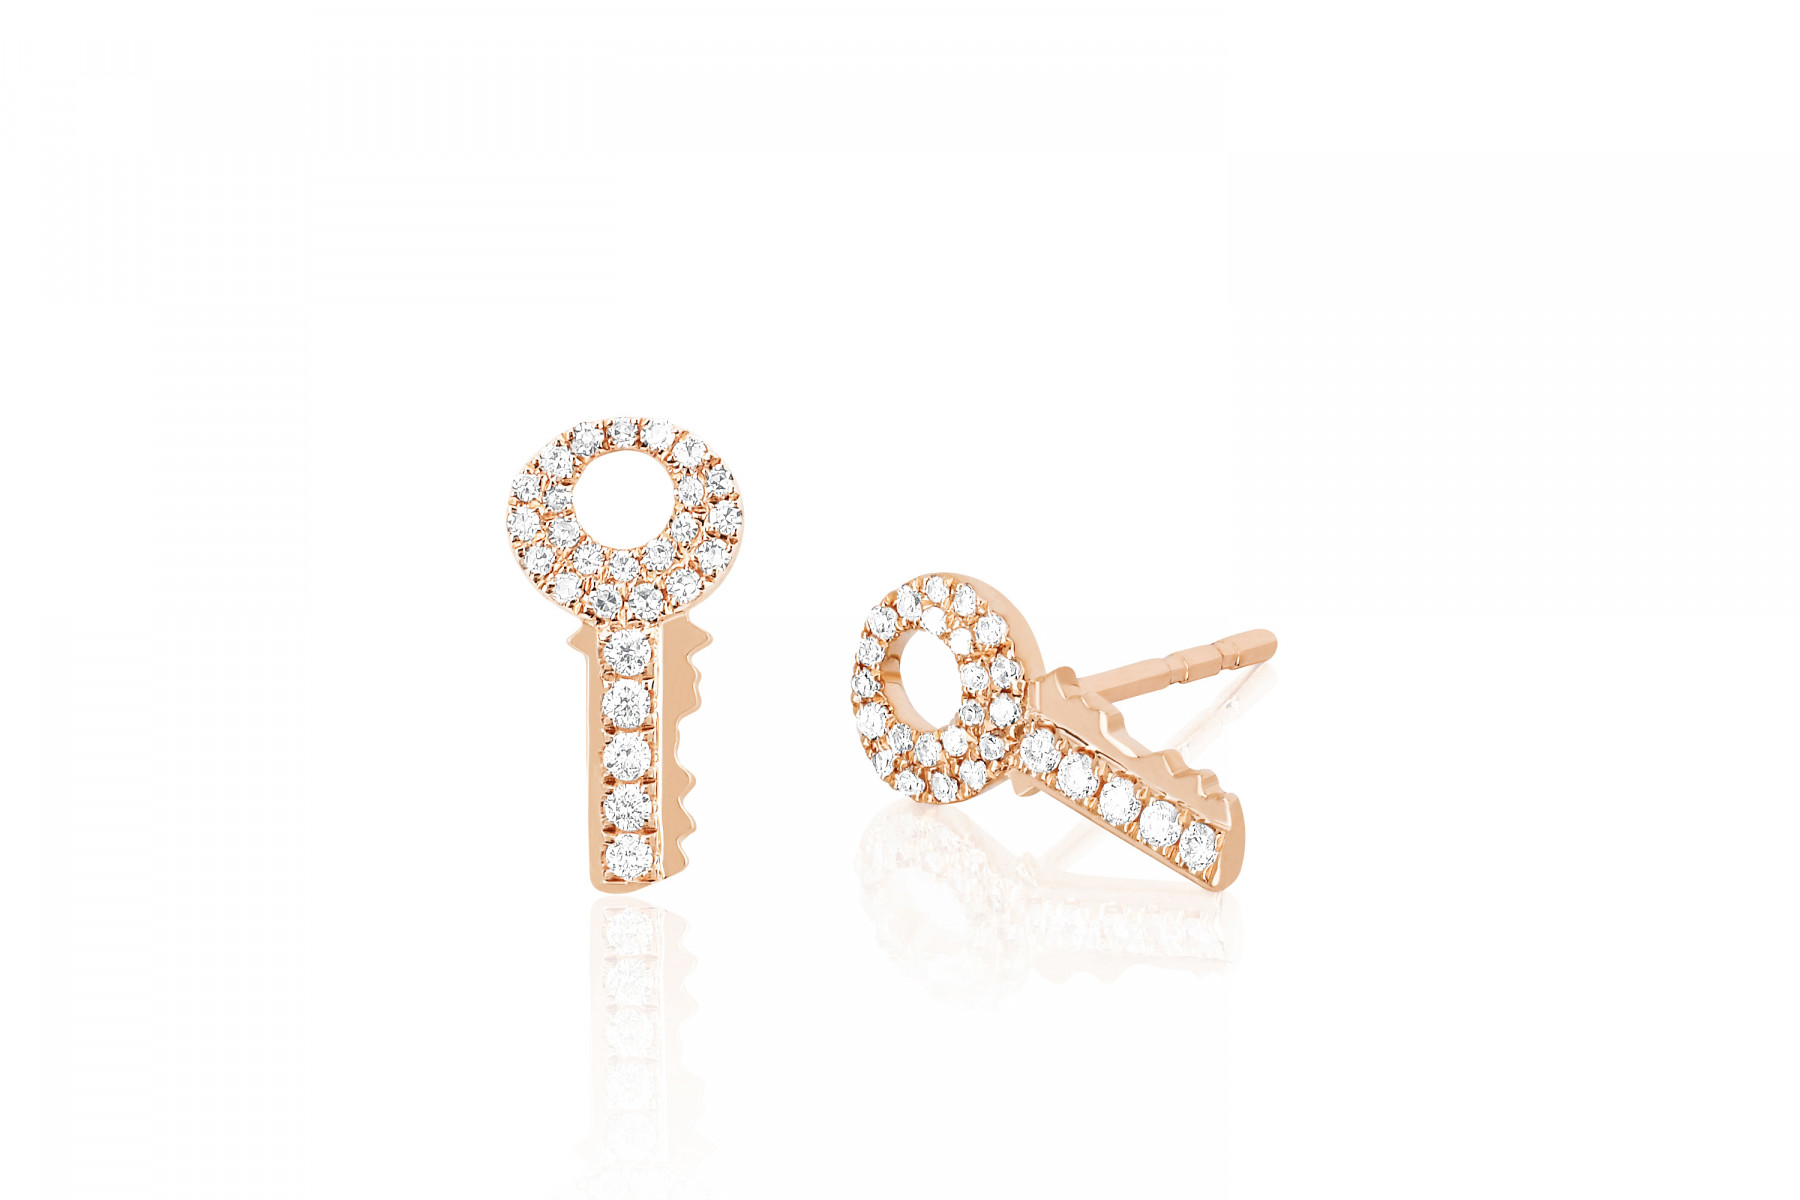 EF Collection Diamond Key Stud Earrings in 14K Rose Gold